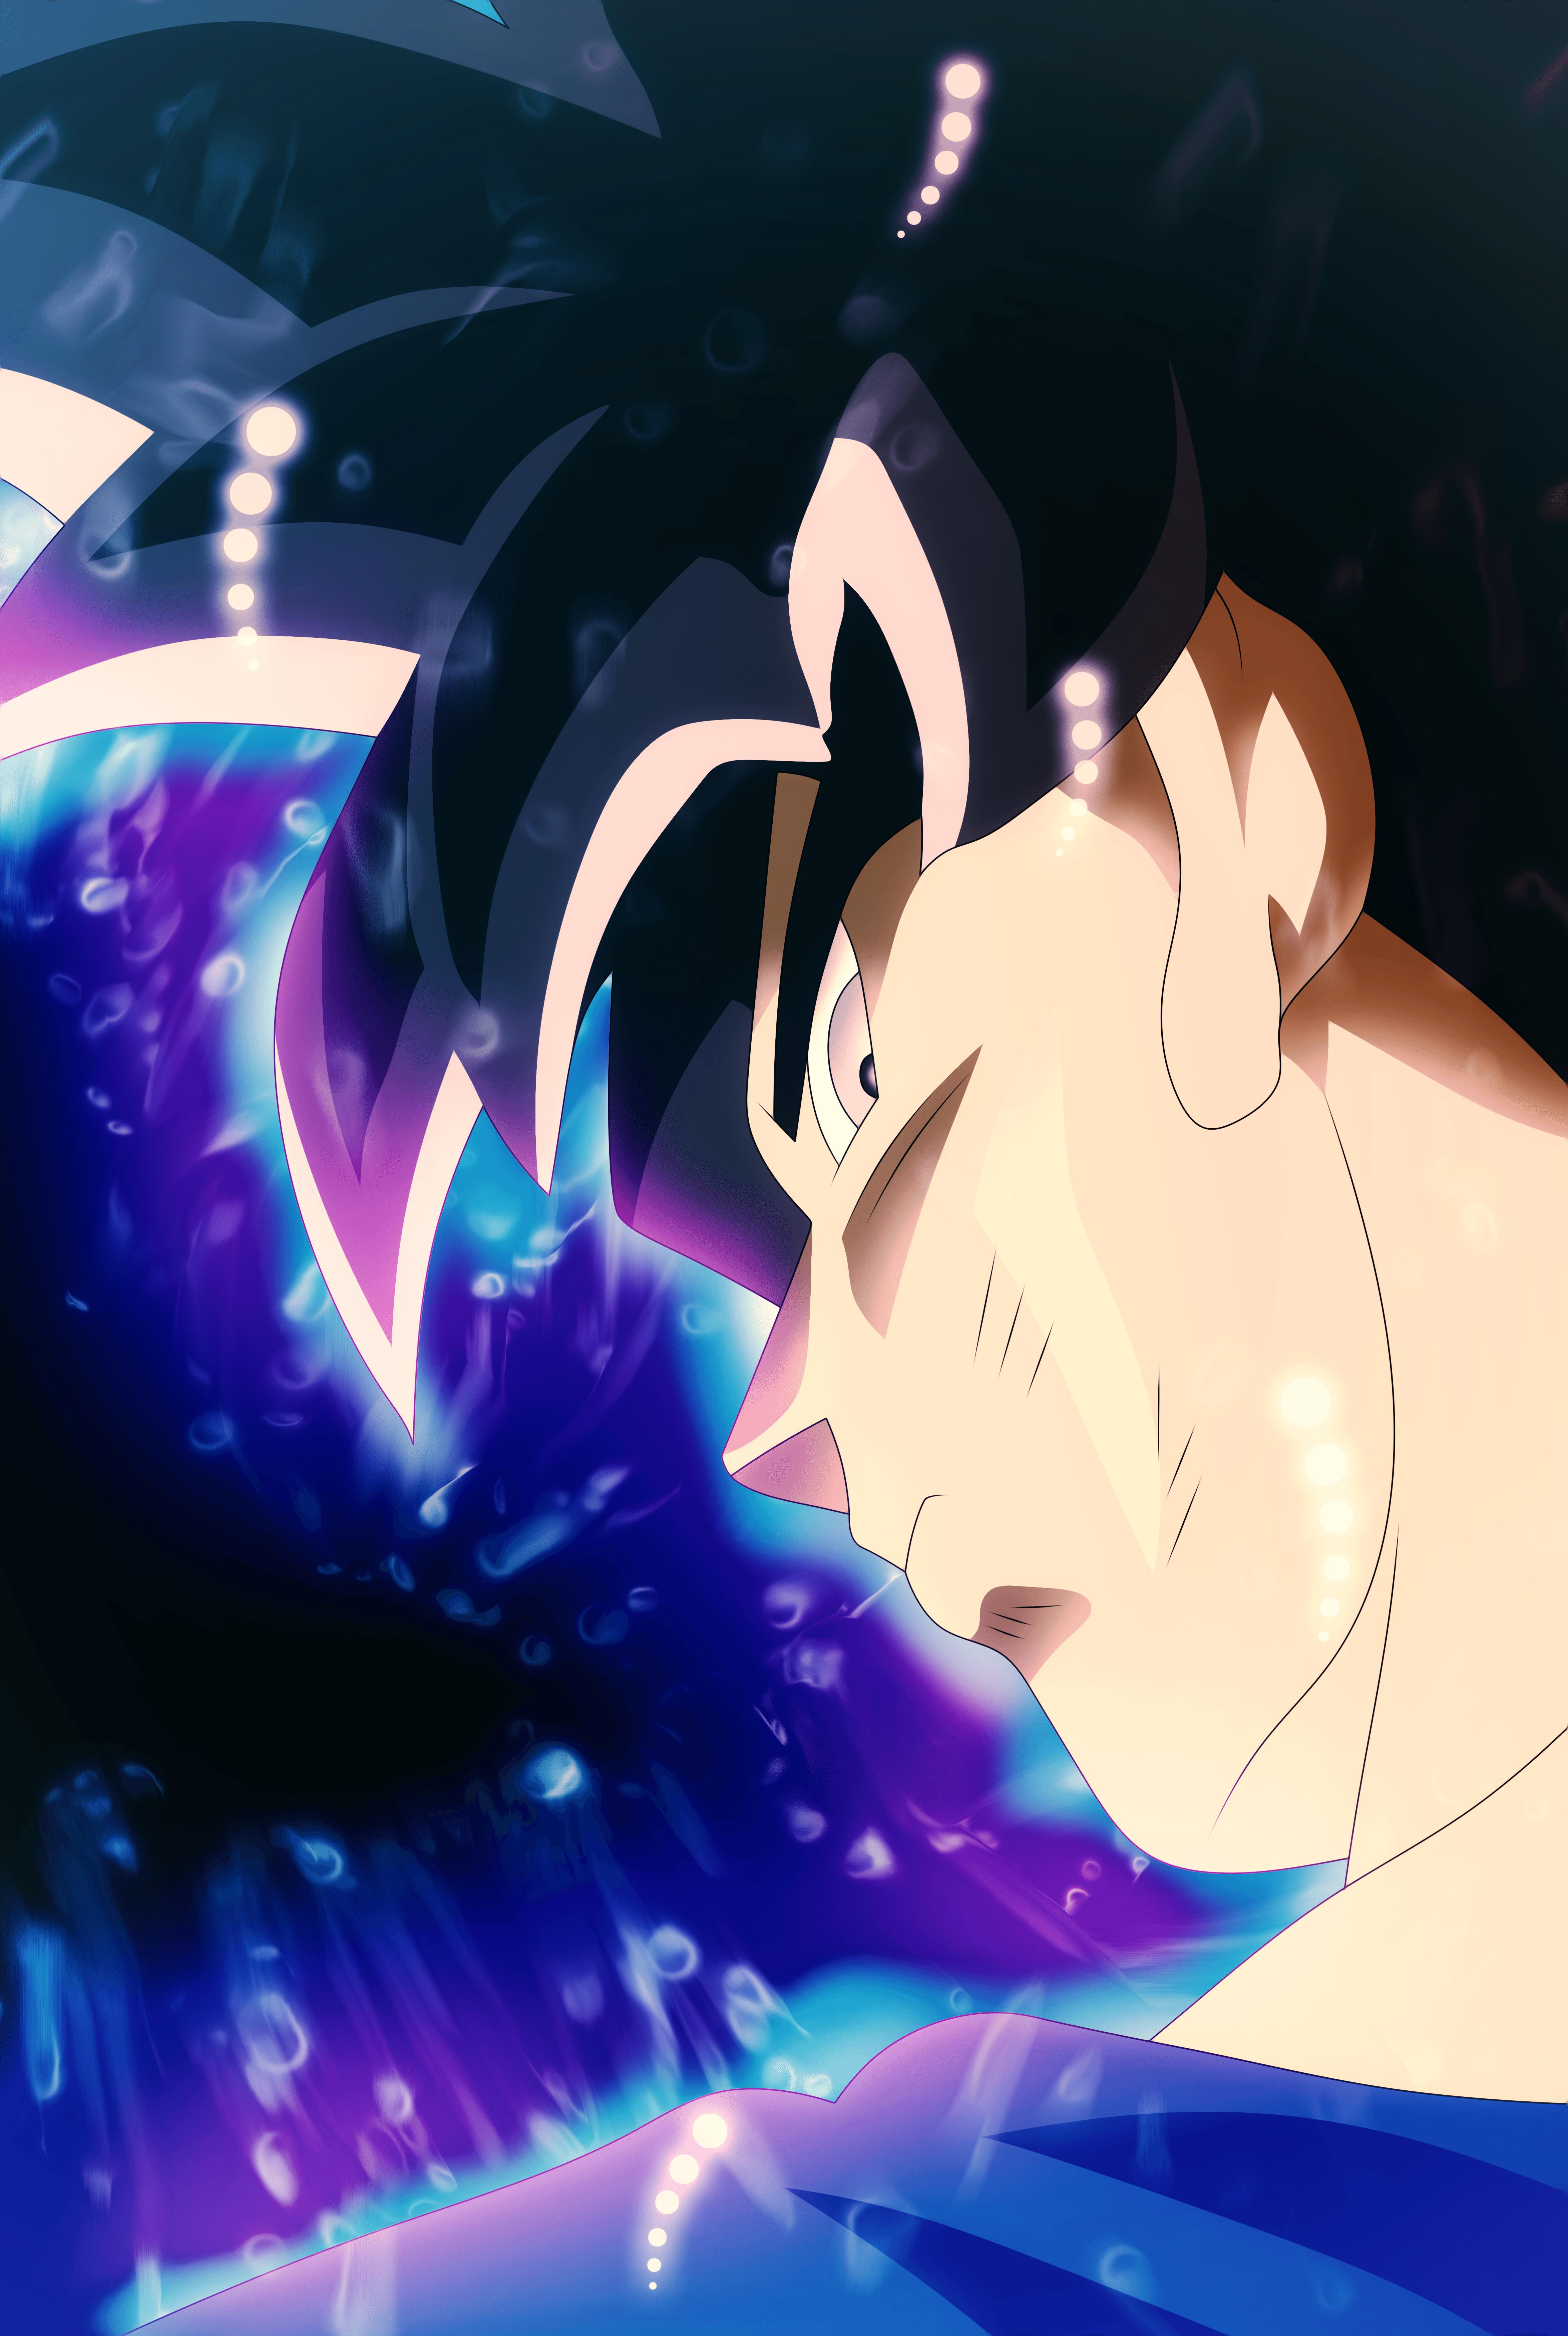 Ultra Instinct Goku Art - ID: 110195 - Art Abyss